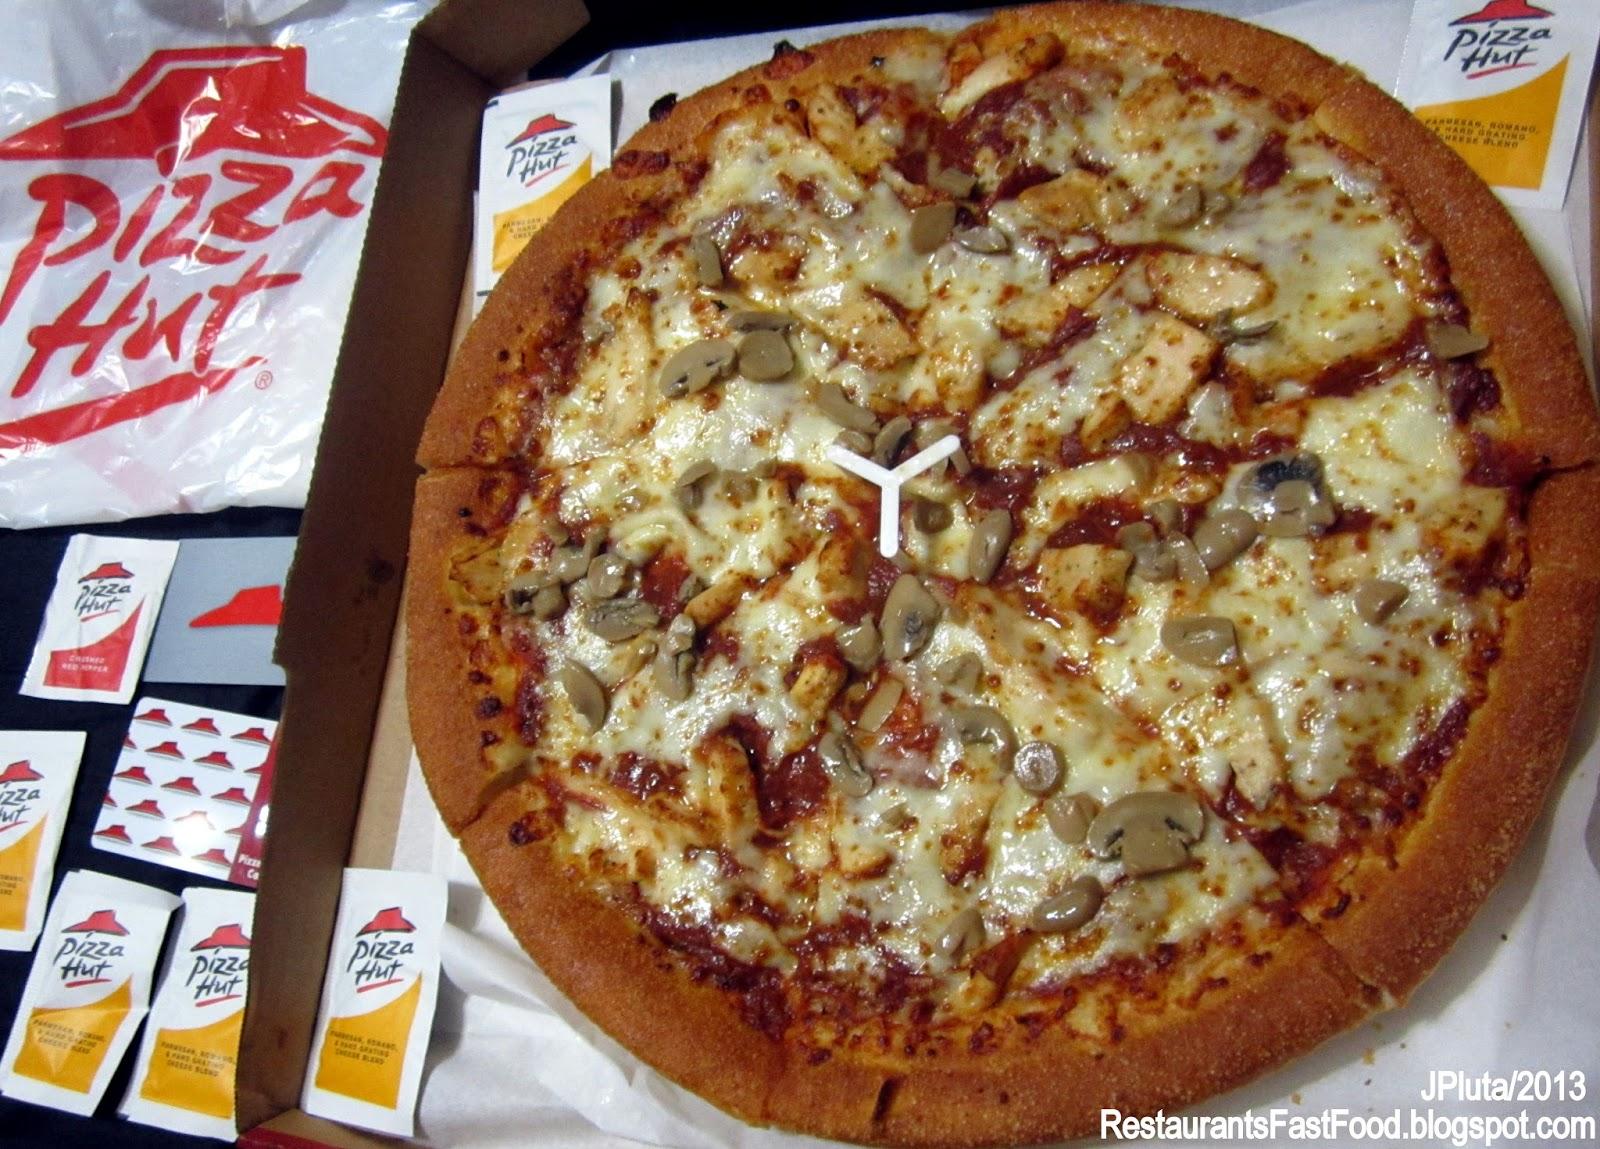 Restaurant Fast Food Menu Mcdonalds Dq Bk Hamburger Pizza